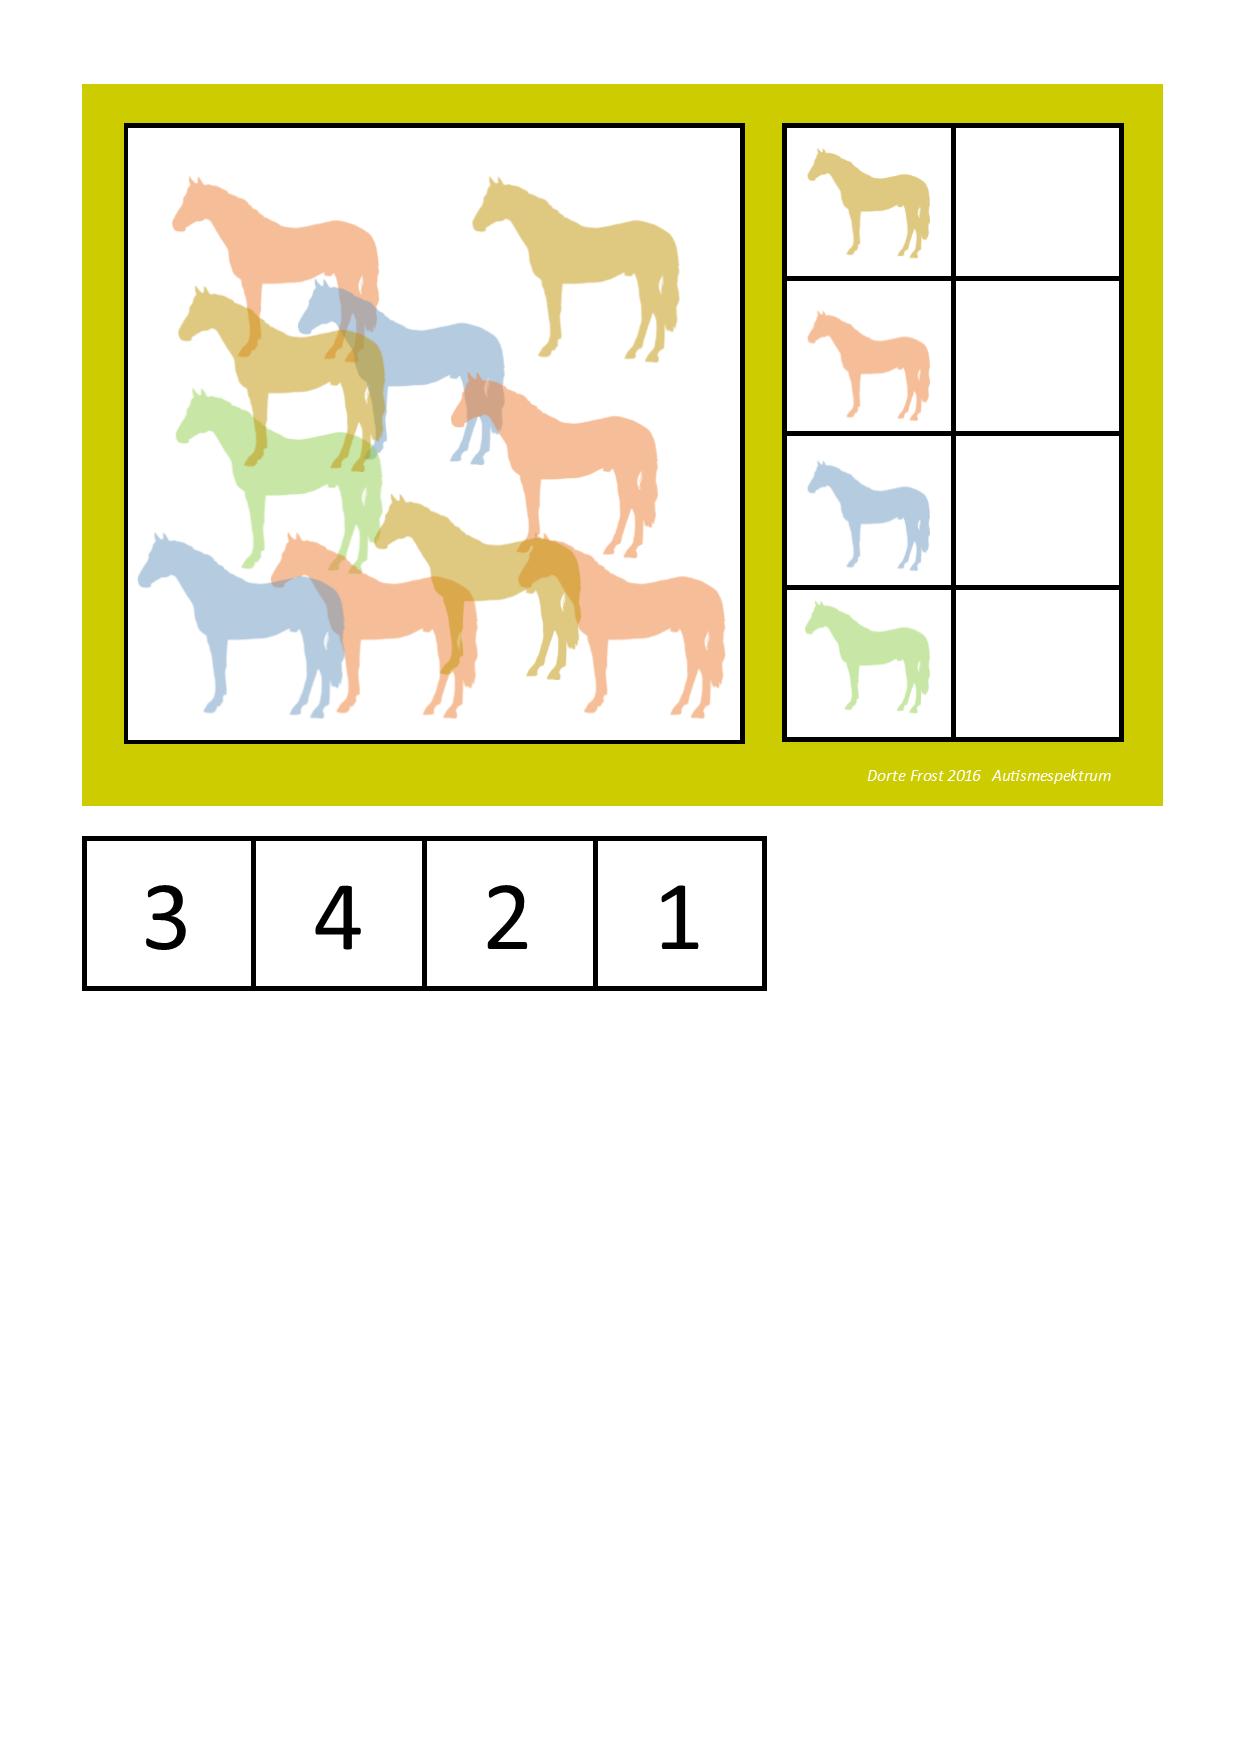 Horse counting game. By Autismespektrum | vizuális diszkrimináció ...